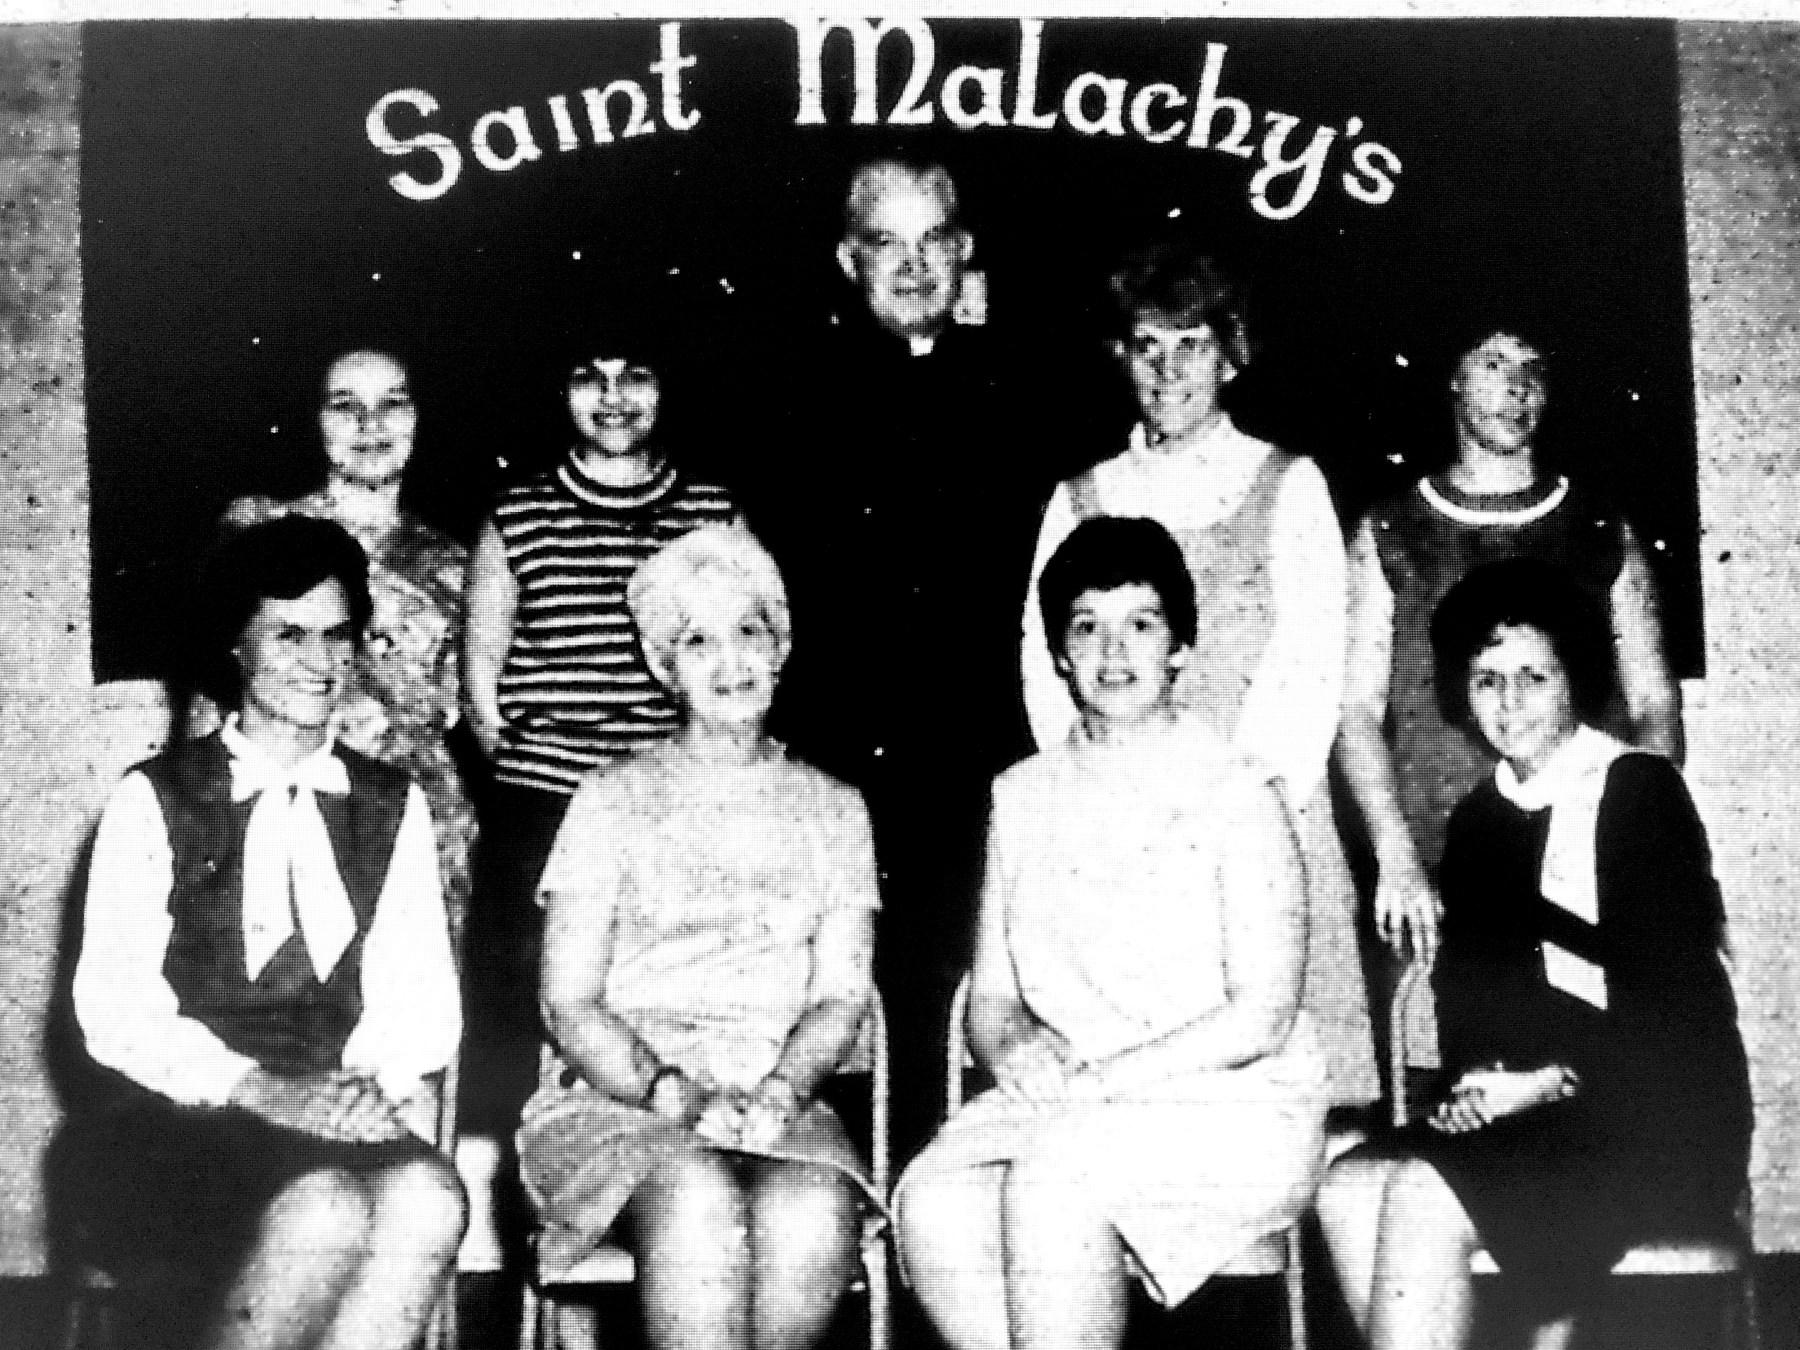 St. Malachy's spring fashion show committee, Burlington MA